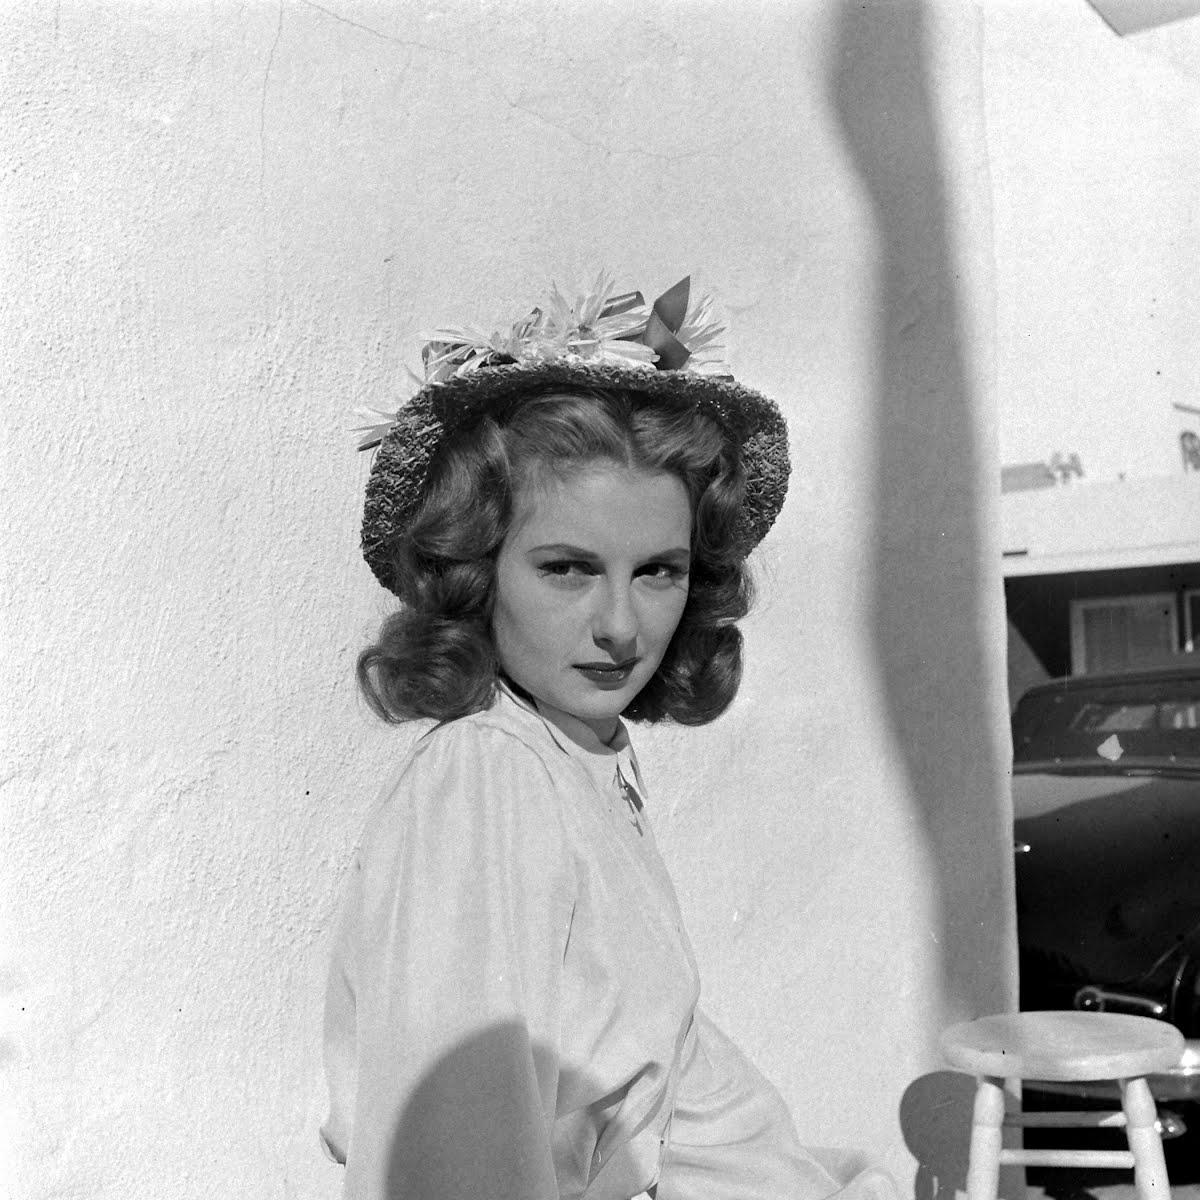 foto Edward Fox (born 1937)